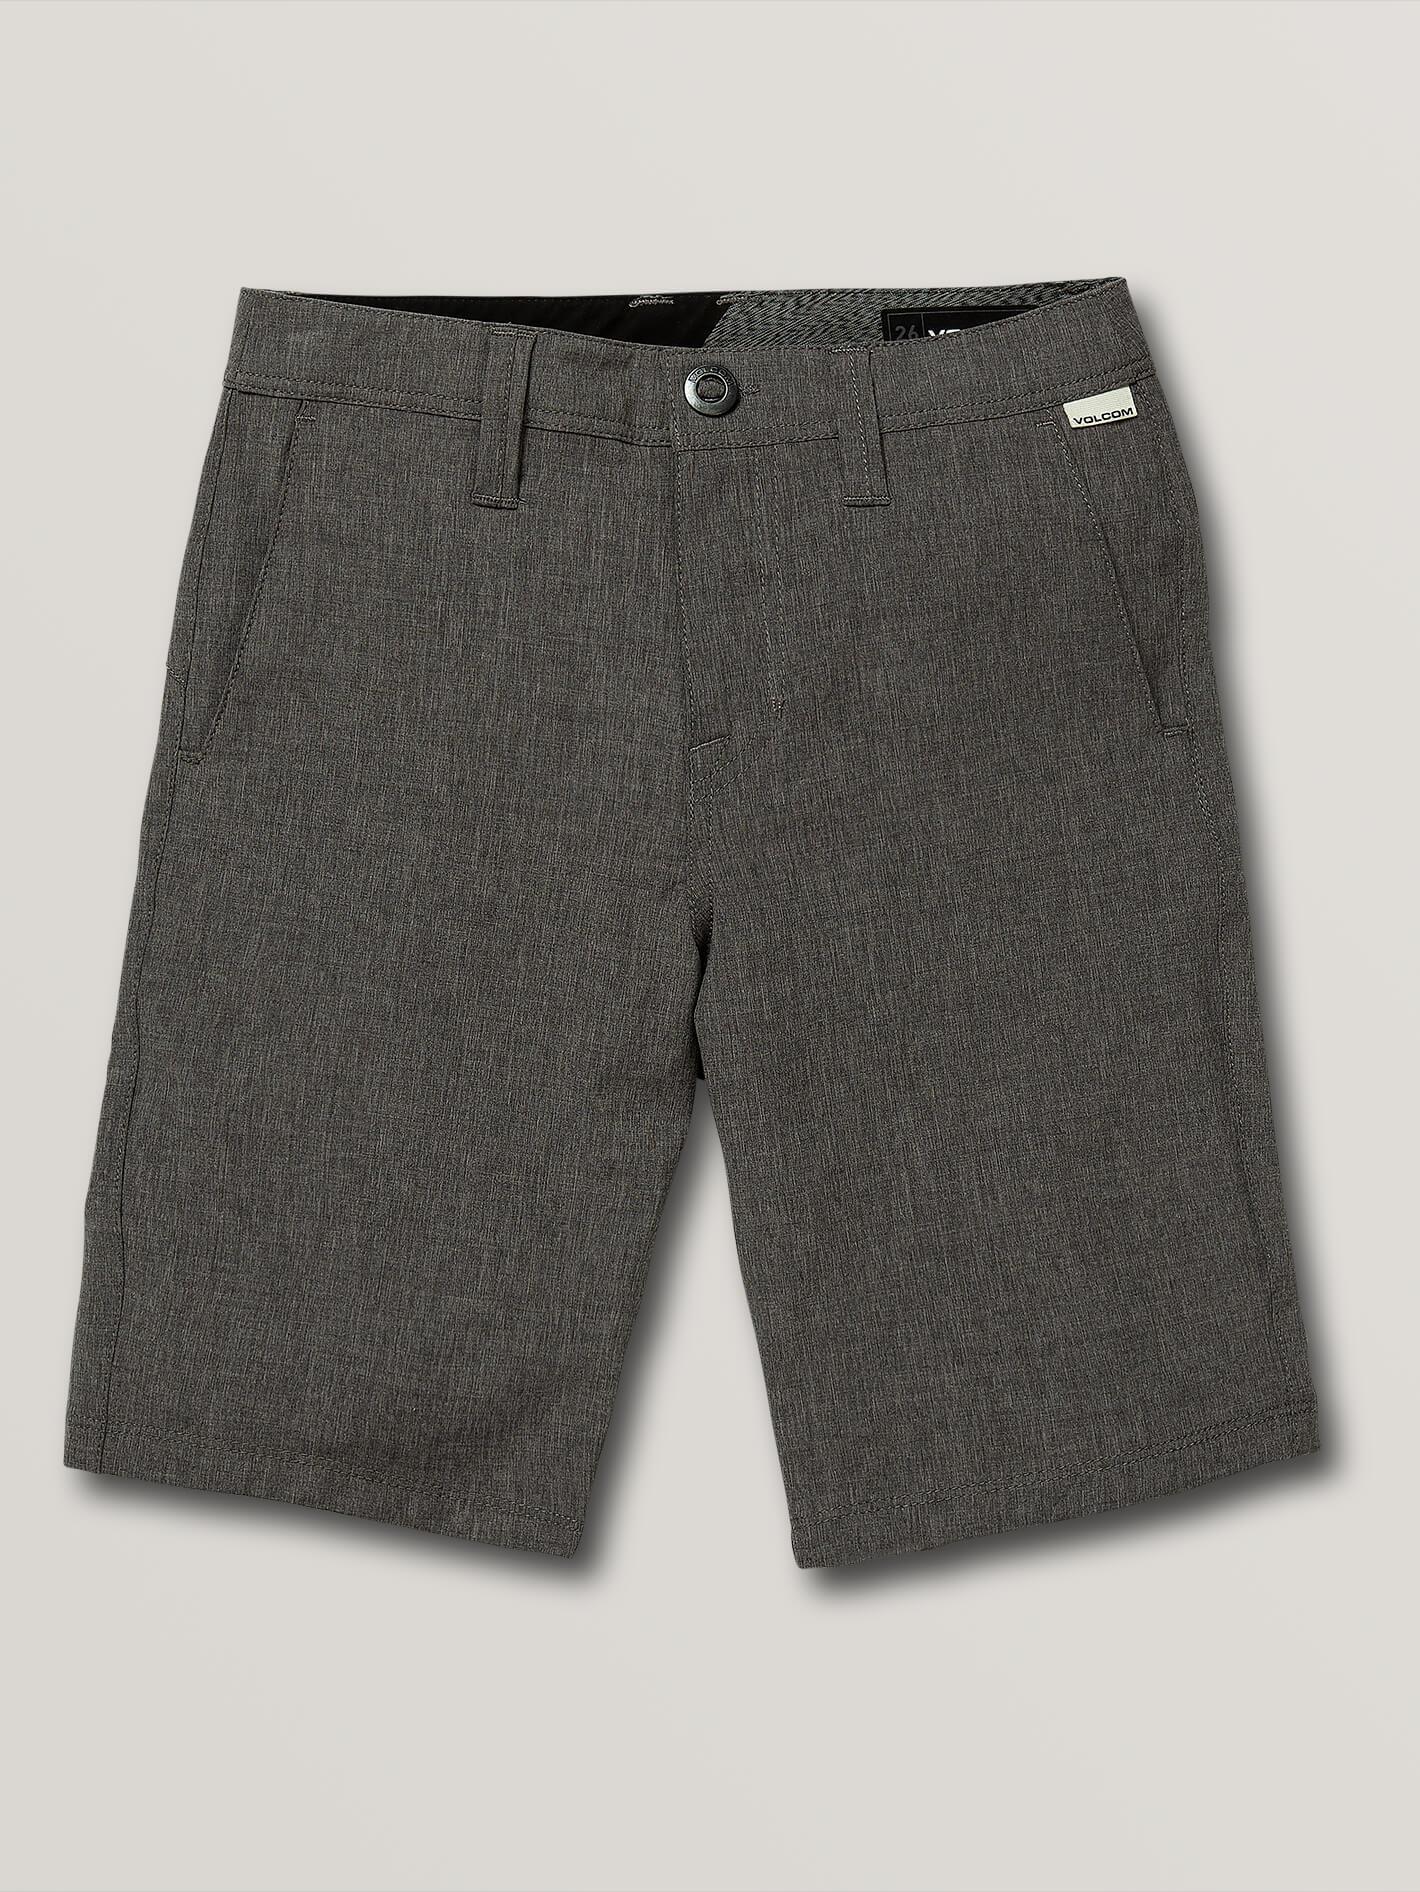 Big Boys Frickin Surf N' Turf Static Hybrid Shorts - CHARCOAL HEATHER / 28